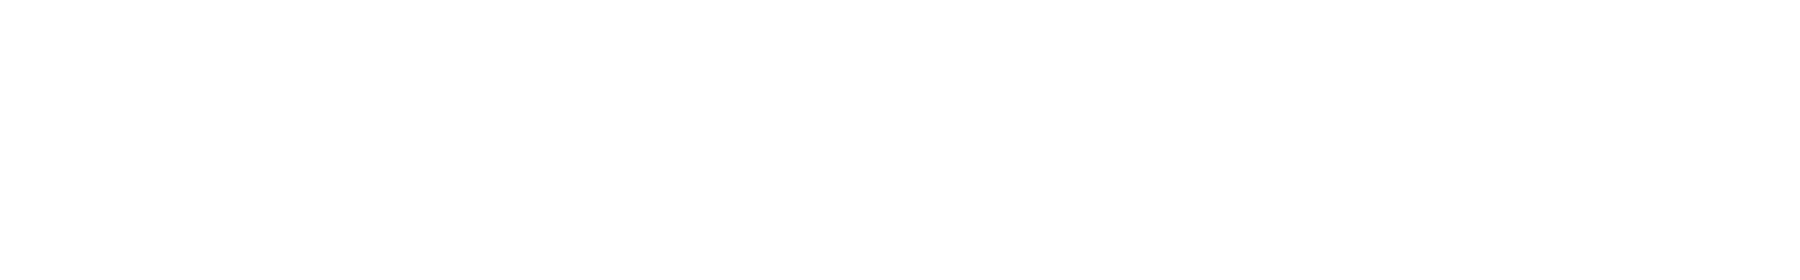 zap system 2